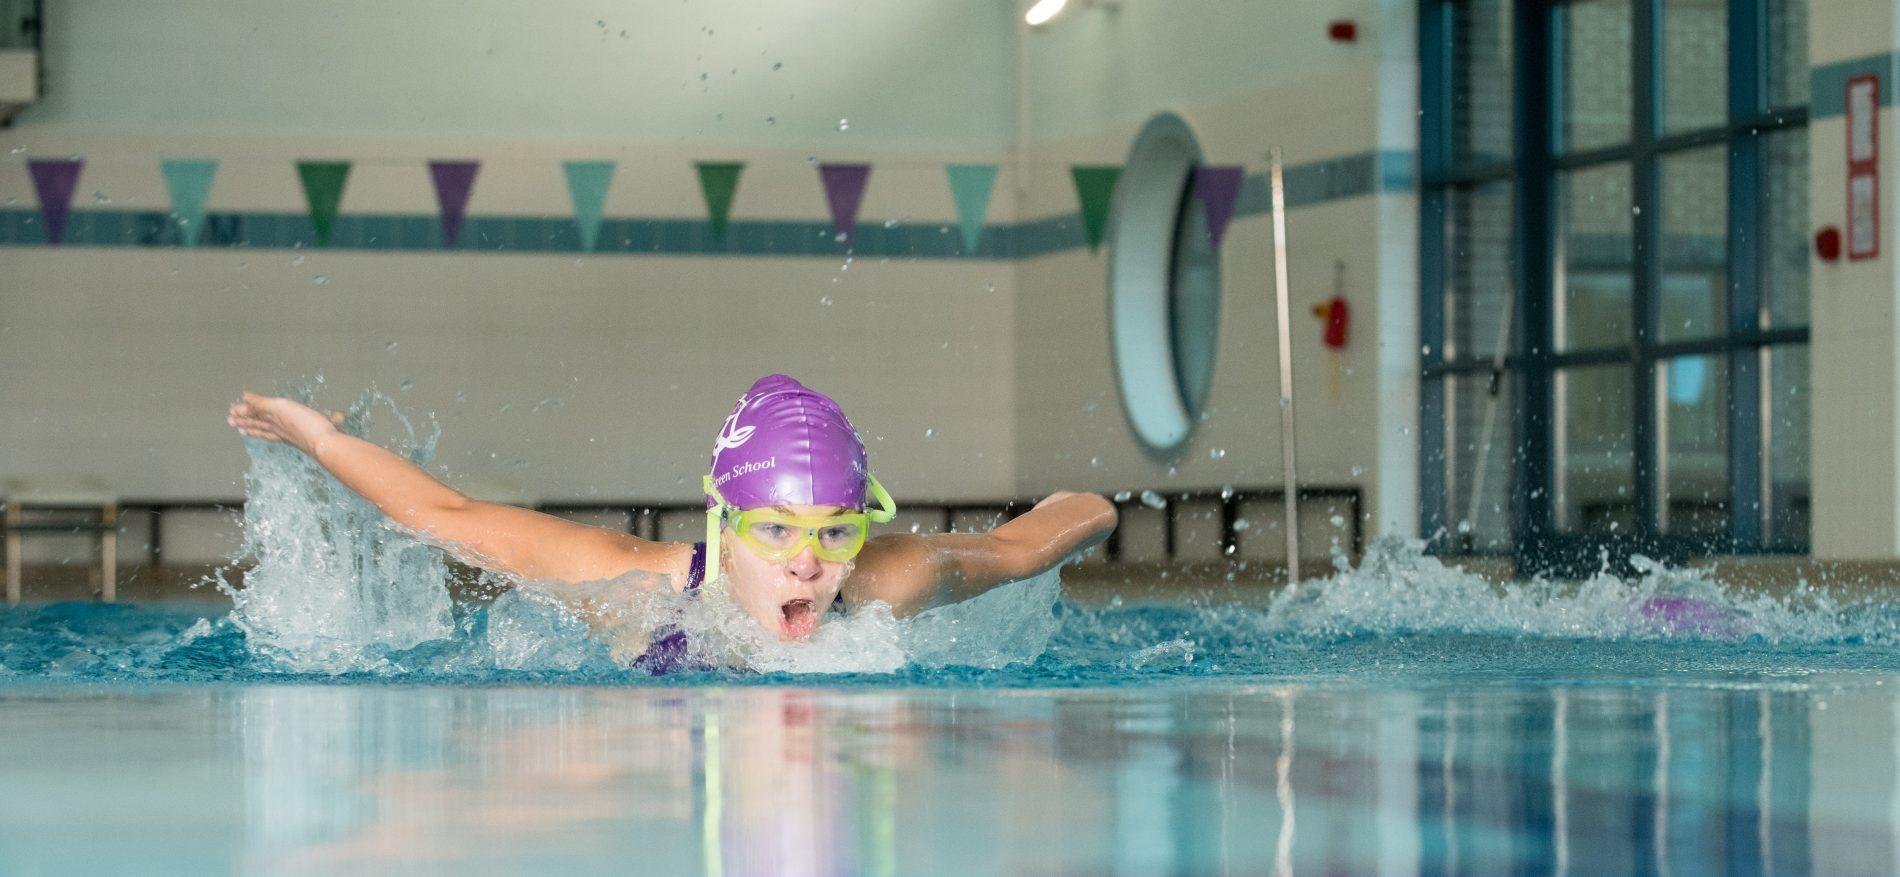 school girl swimming